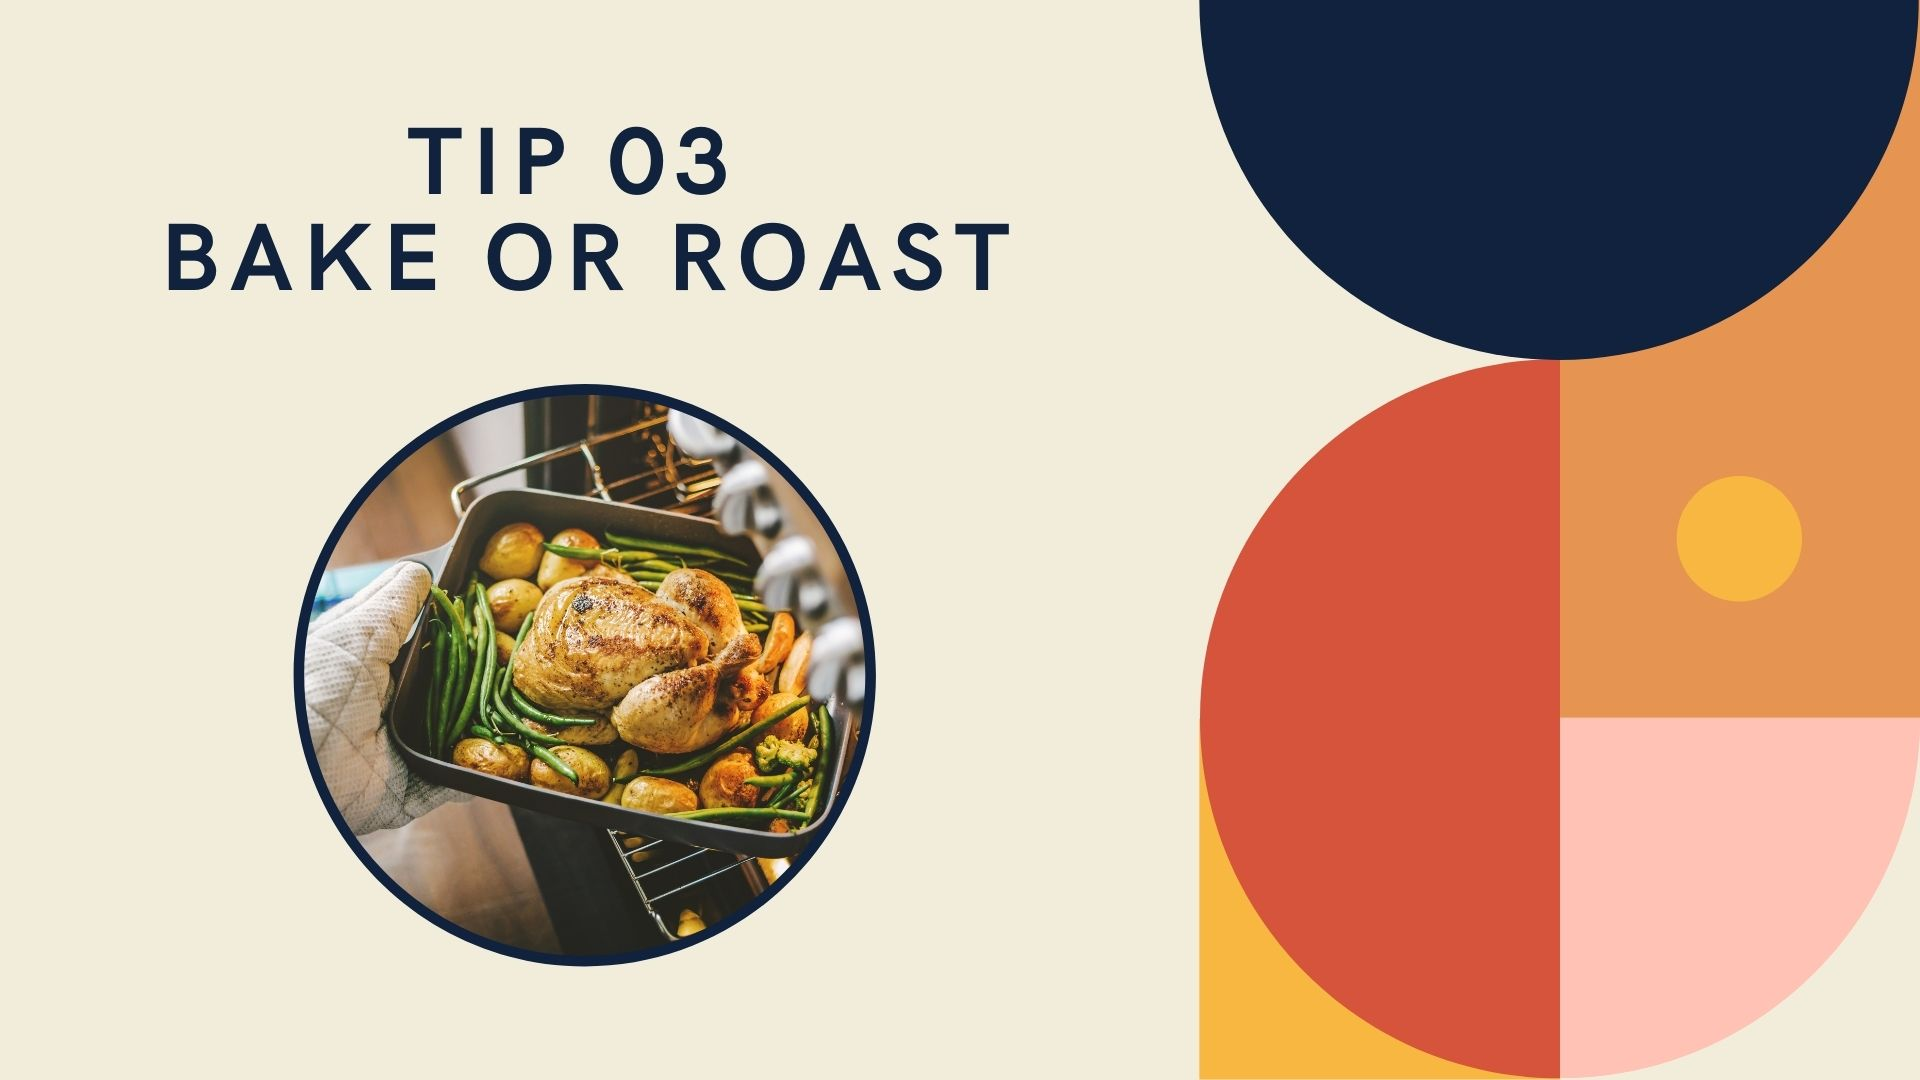 tip 3 bake or roast